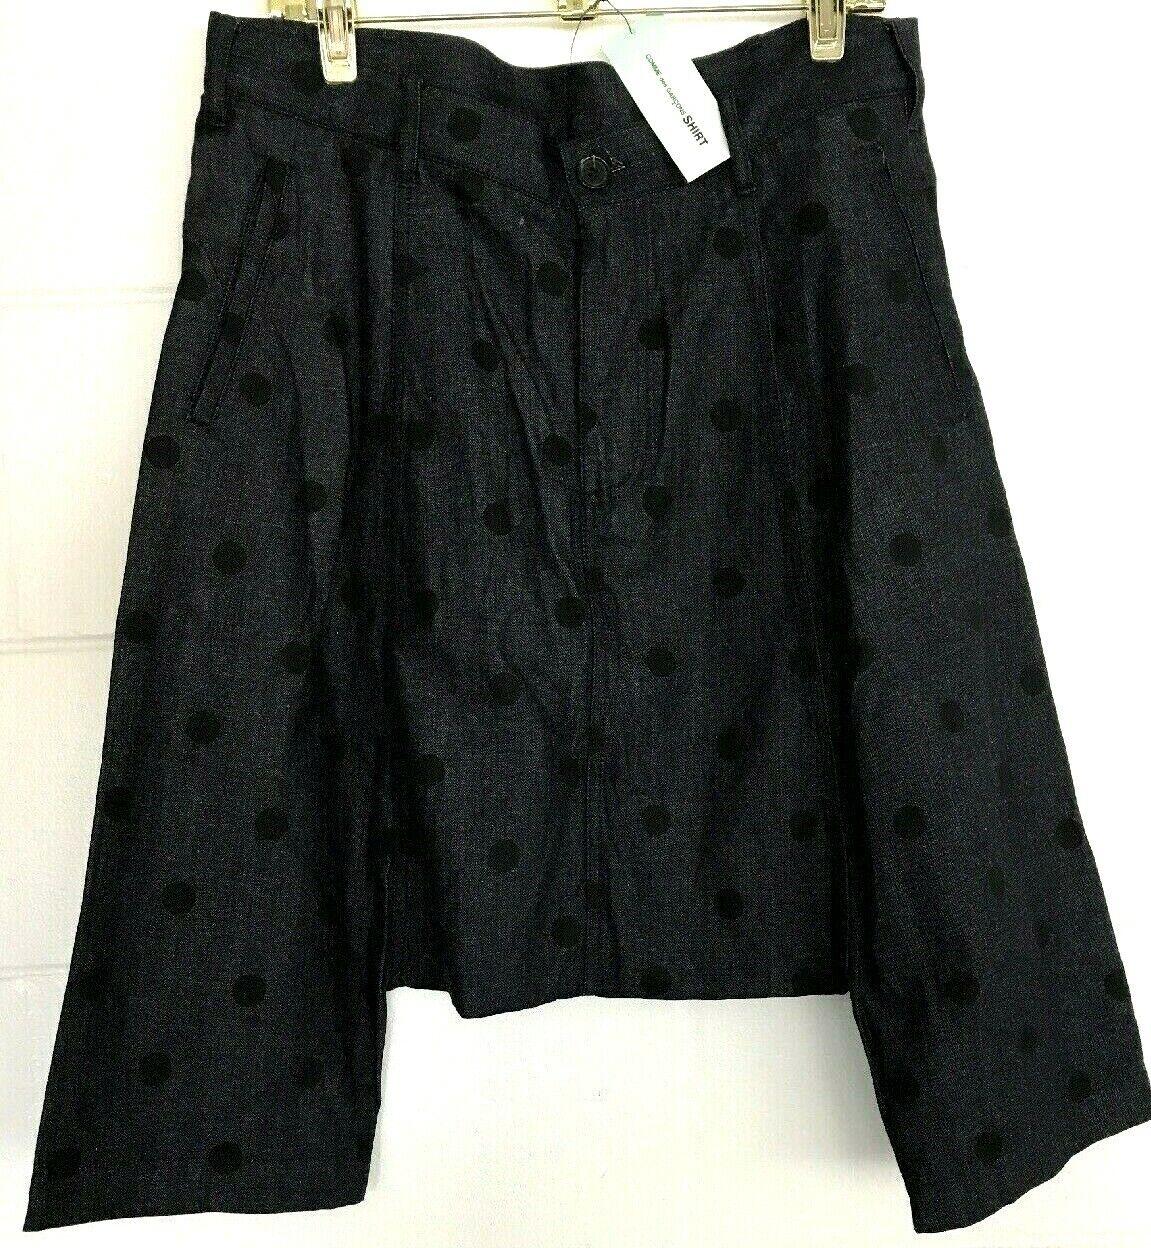 New COMME DES GARCONS shirt SHORTS Lagenlook Size S Art-to-Wear NWT Denim DOTS